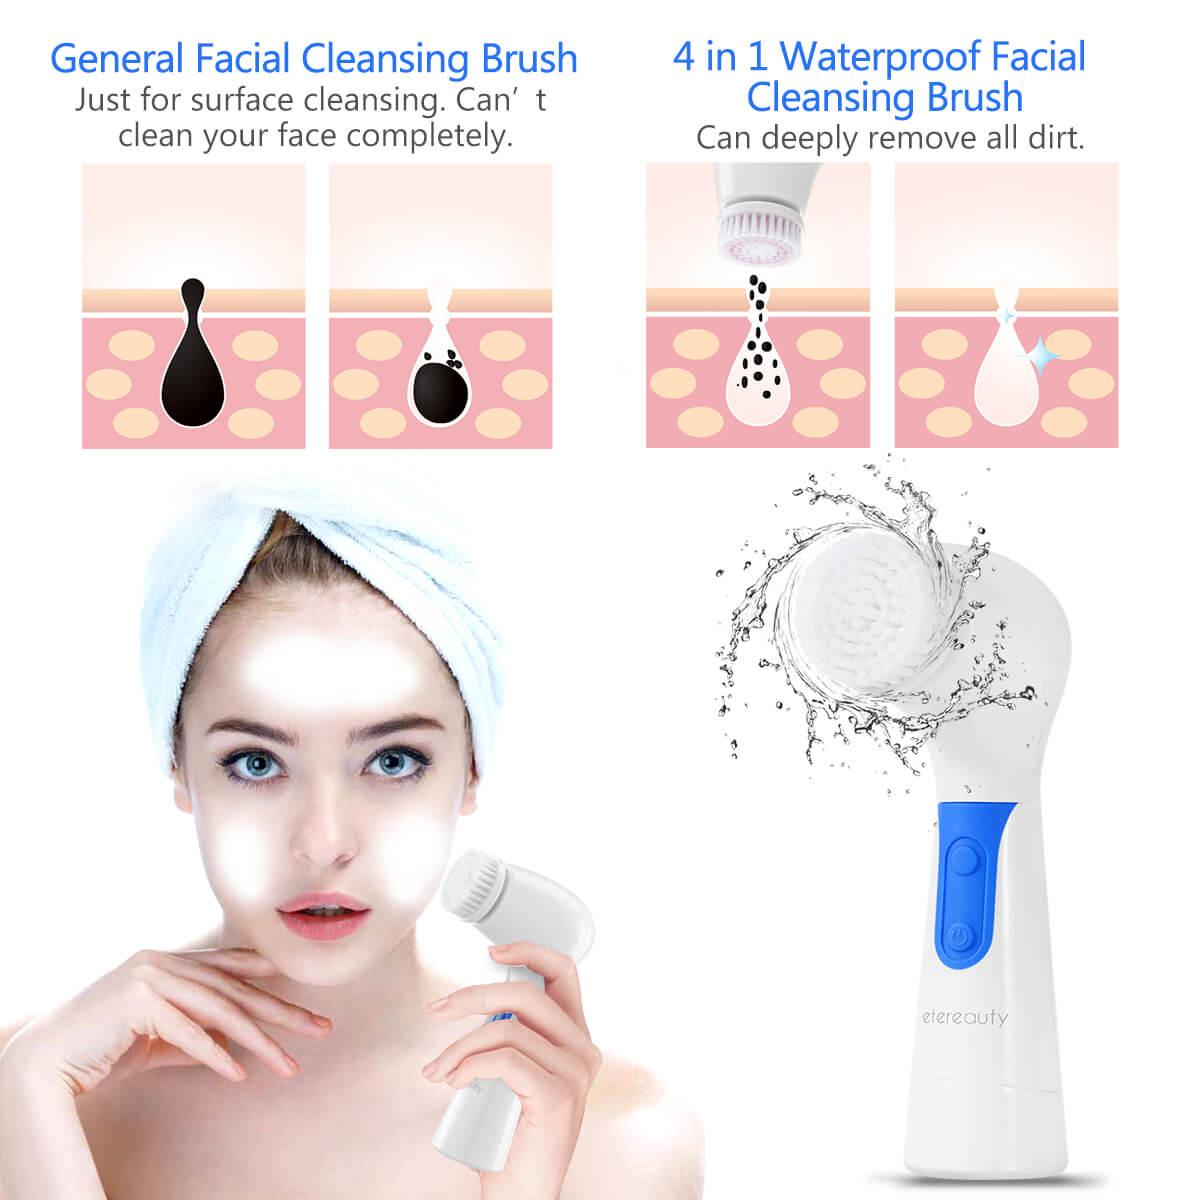 Facial Brush, Waterproof Facial Cleansing Brush Spin Brush 4-in-1 Set, Blue